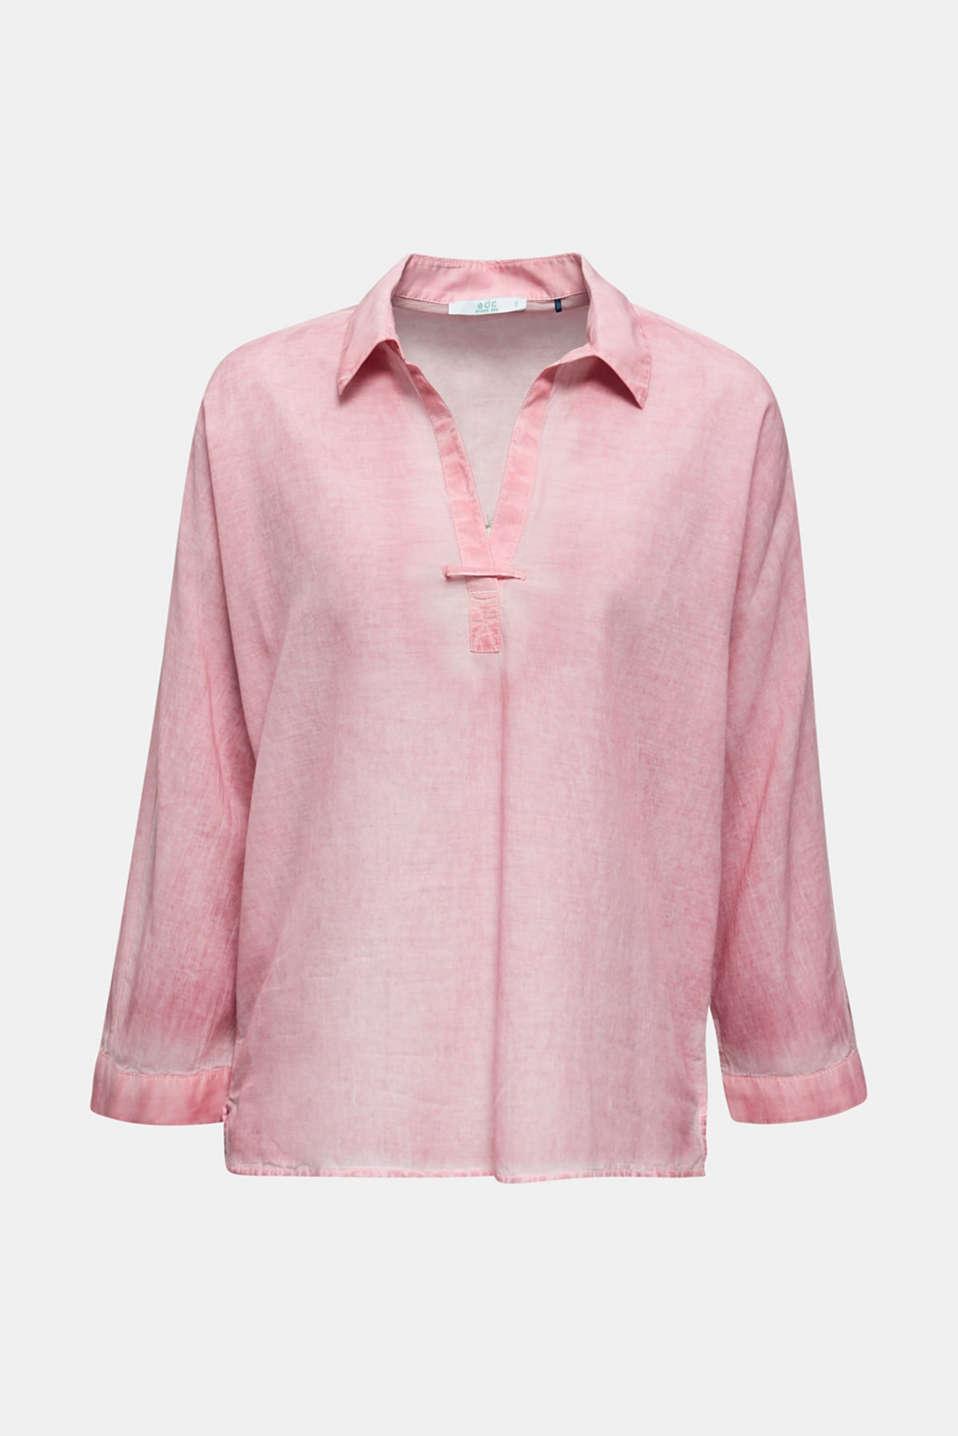 Batik blouse made of cotton, PINK, detail image number 6